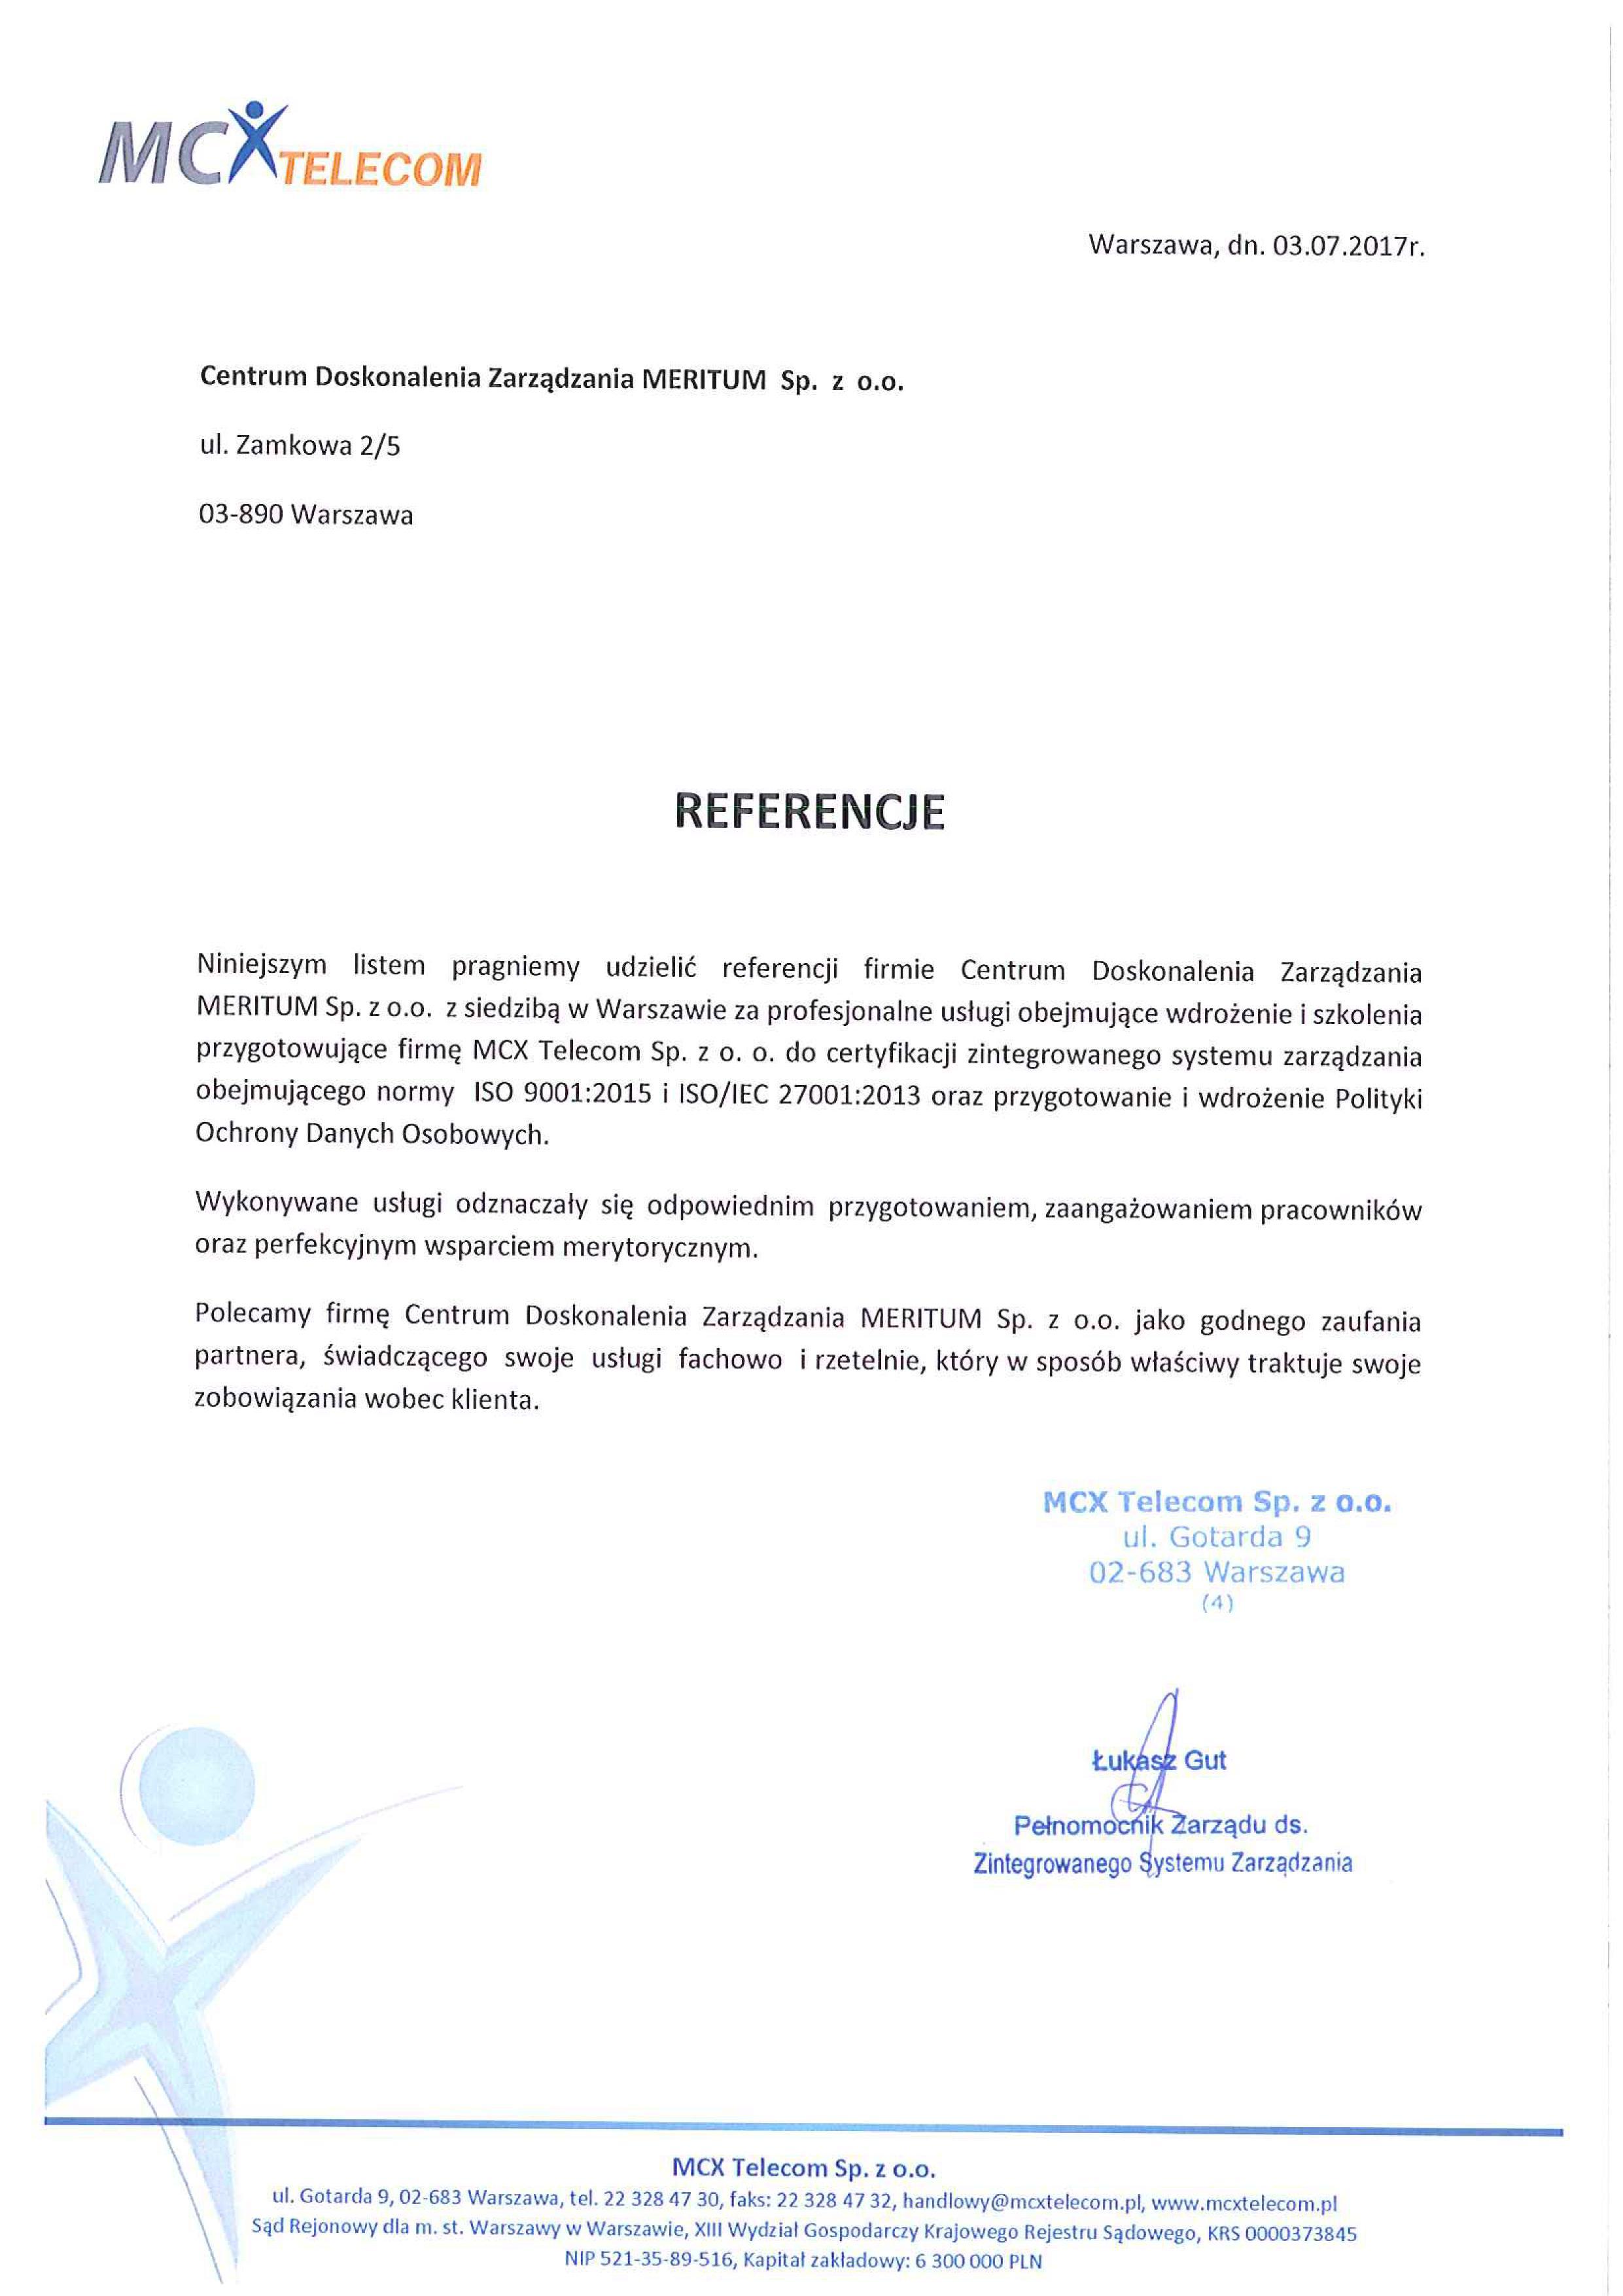 MCX Telecom